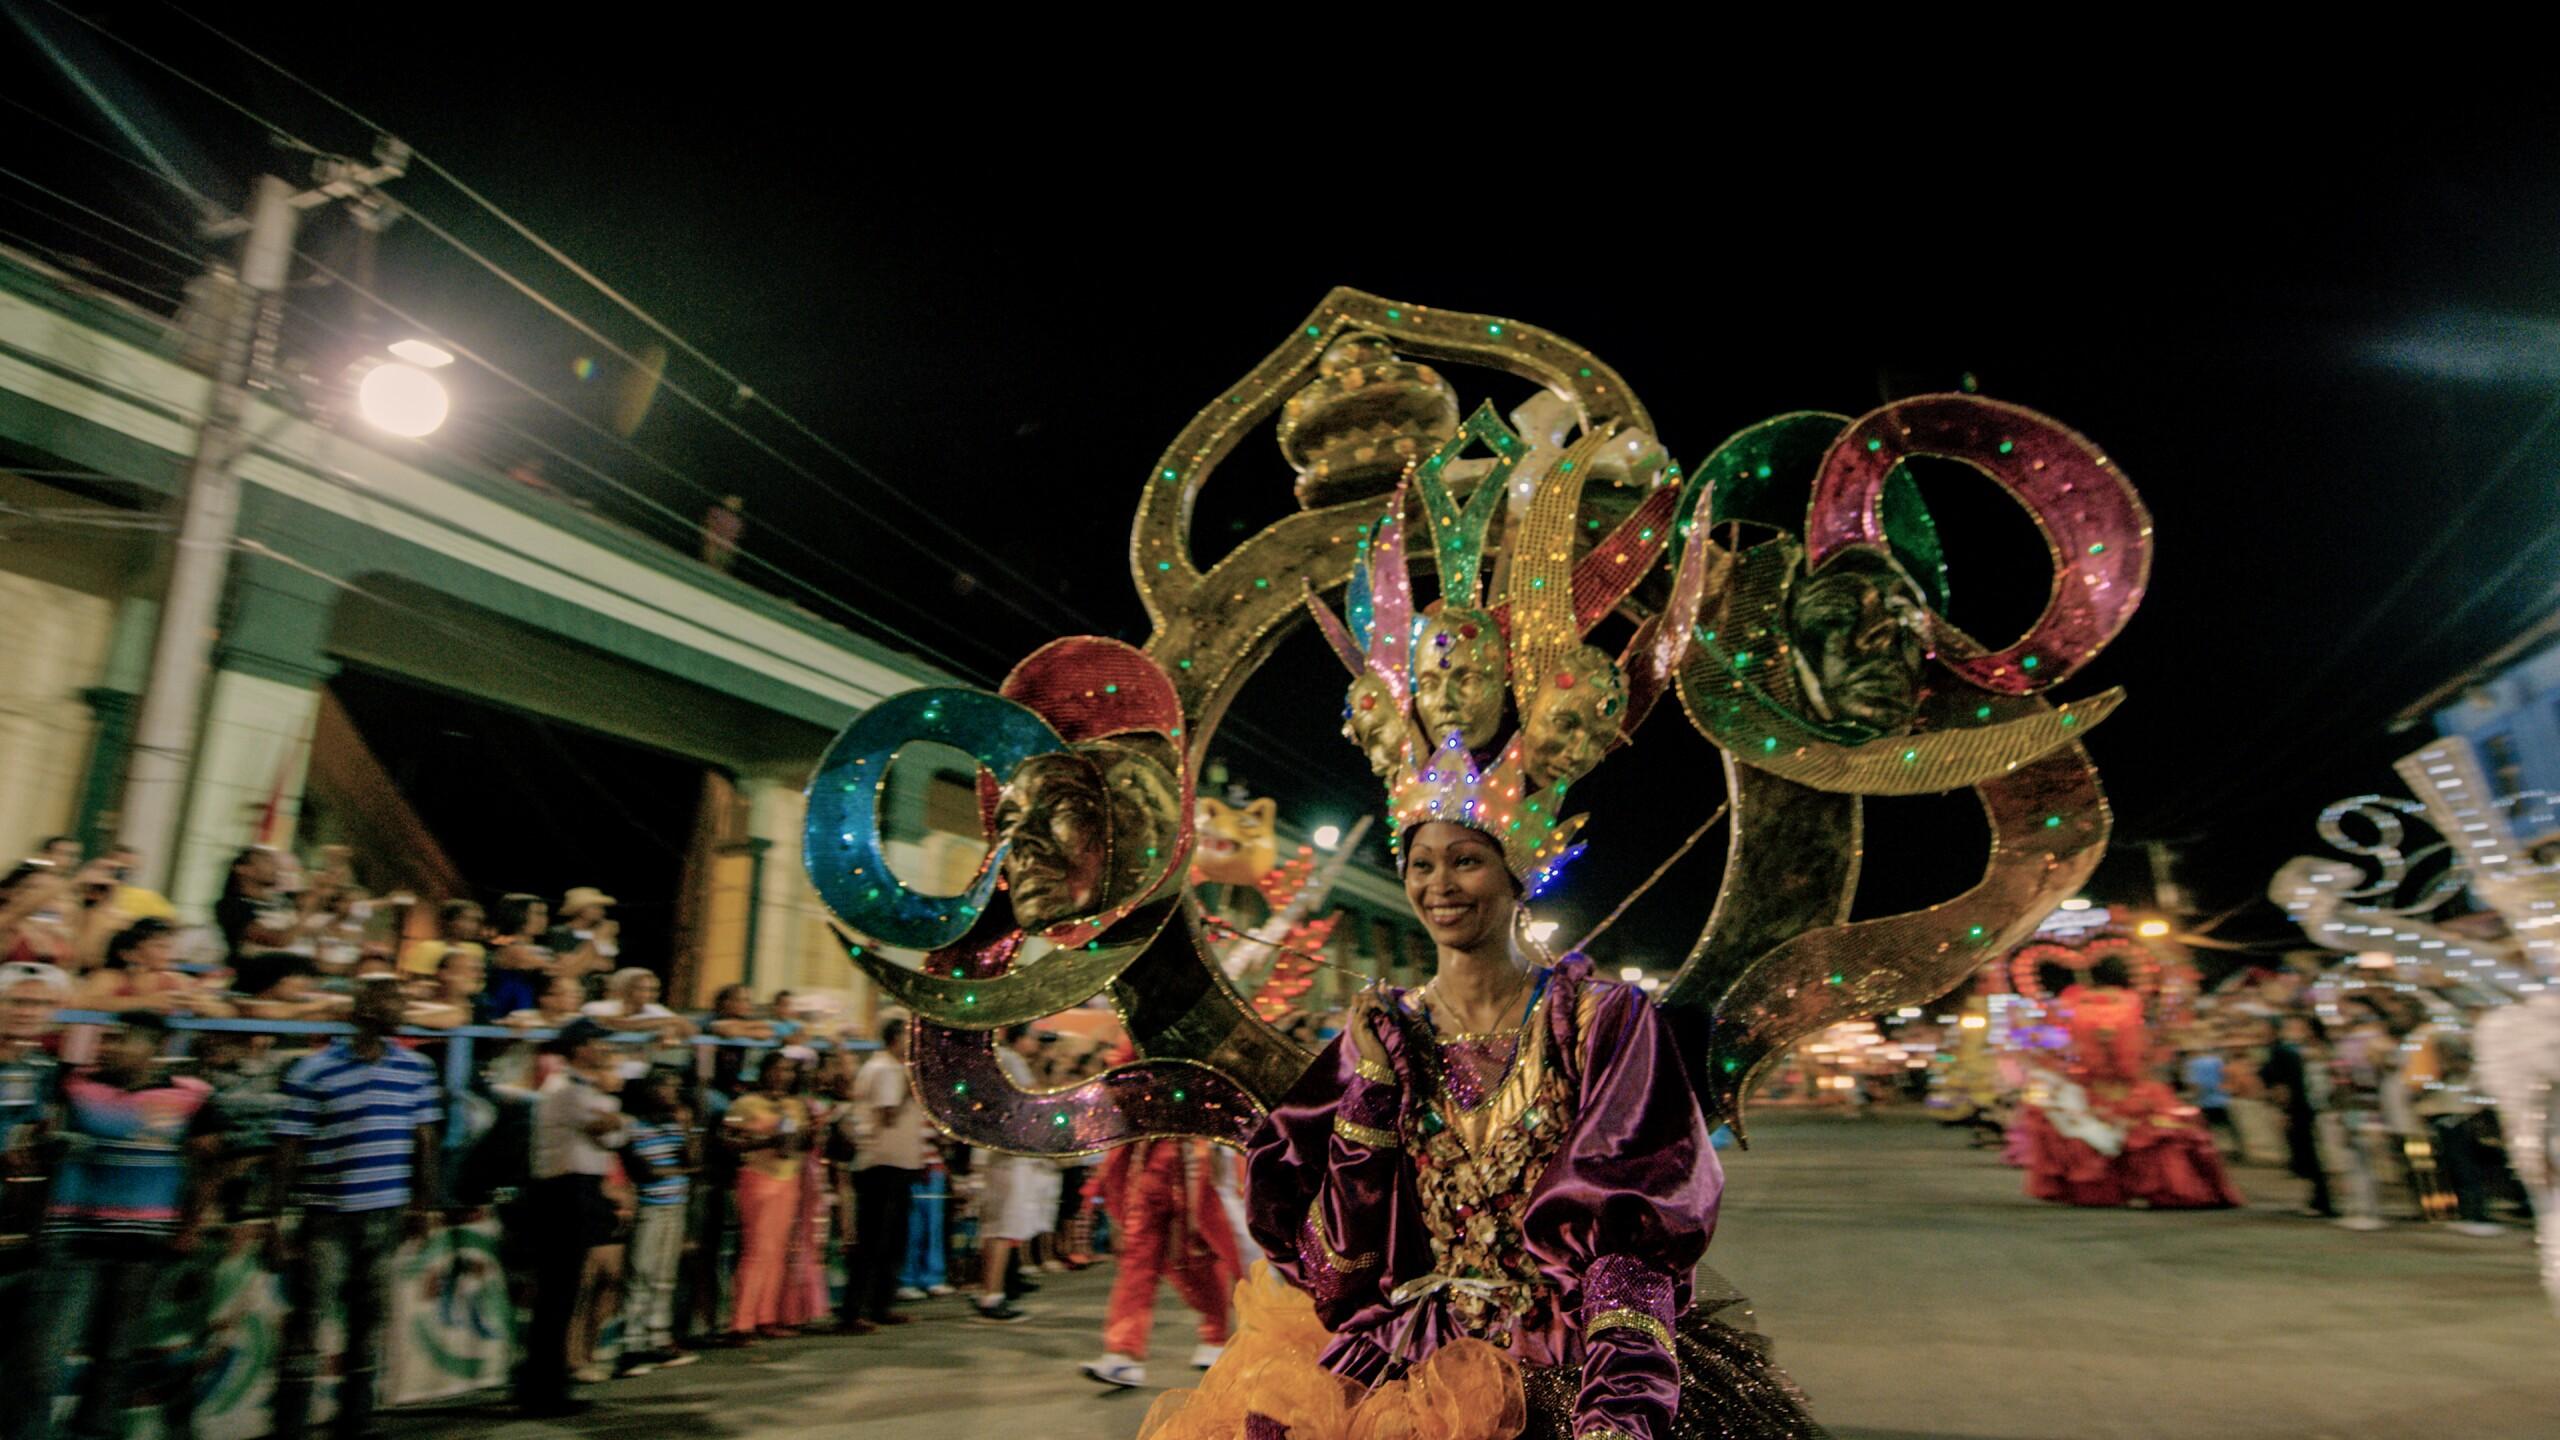 Cuba Carnival dancer